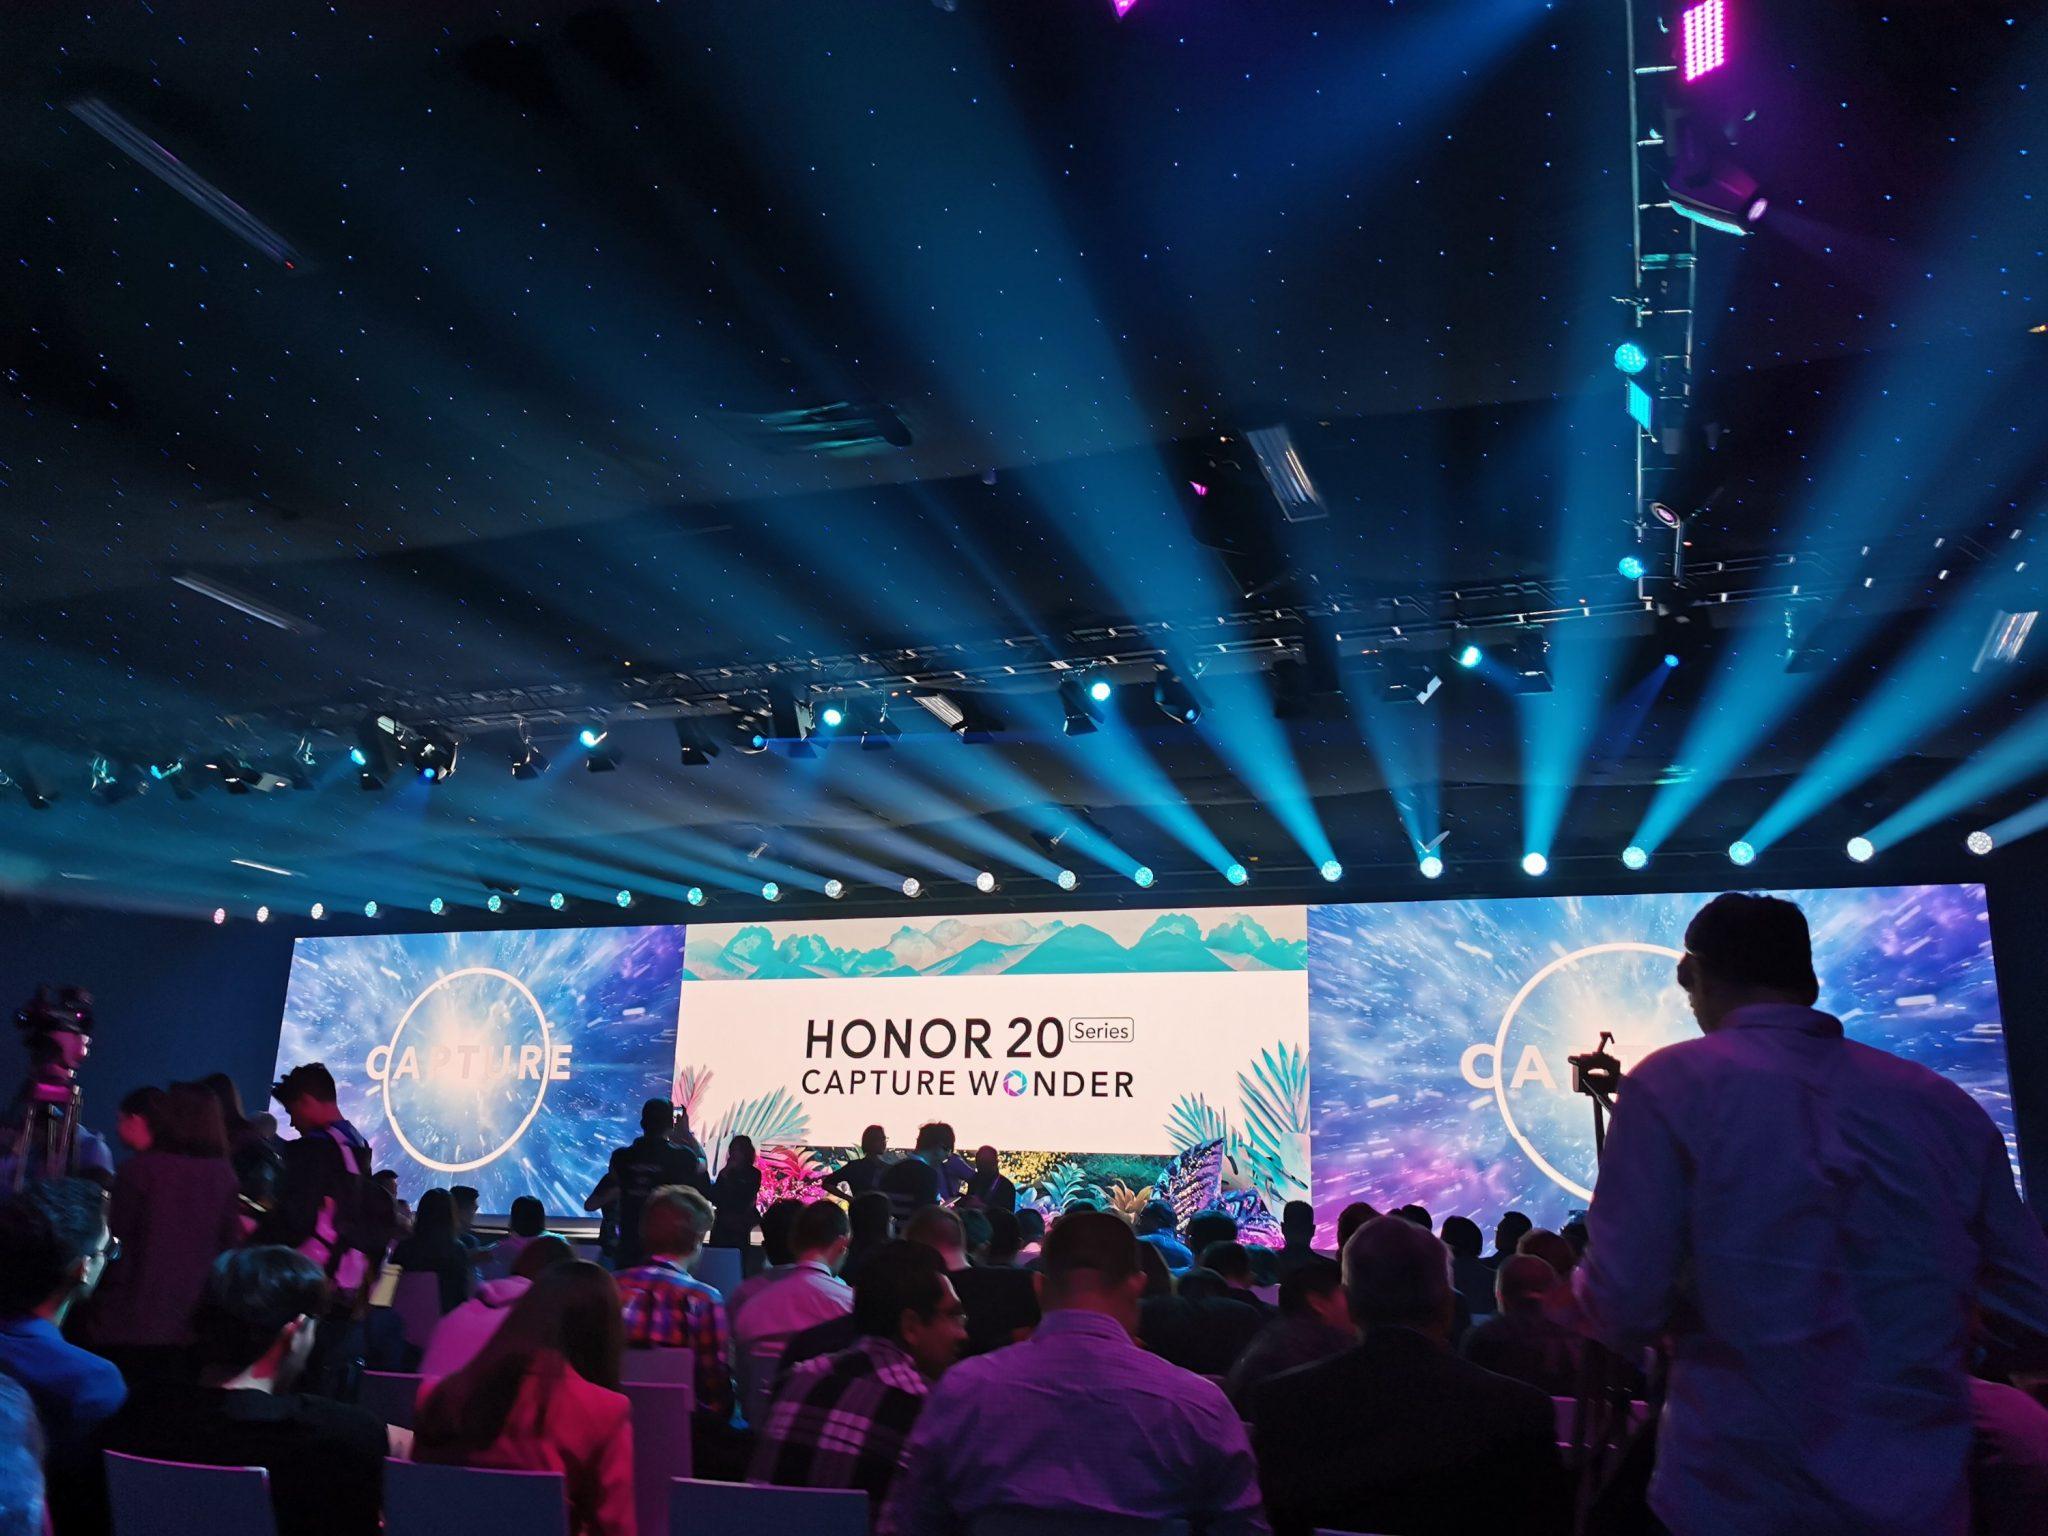 Honor 20 Series live stream